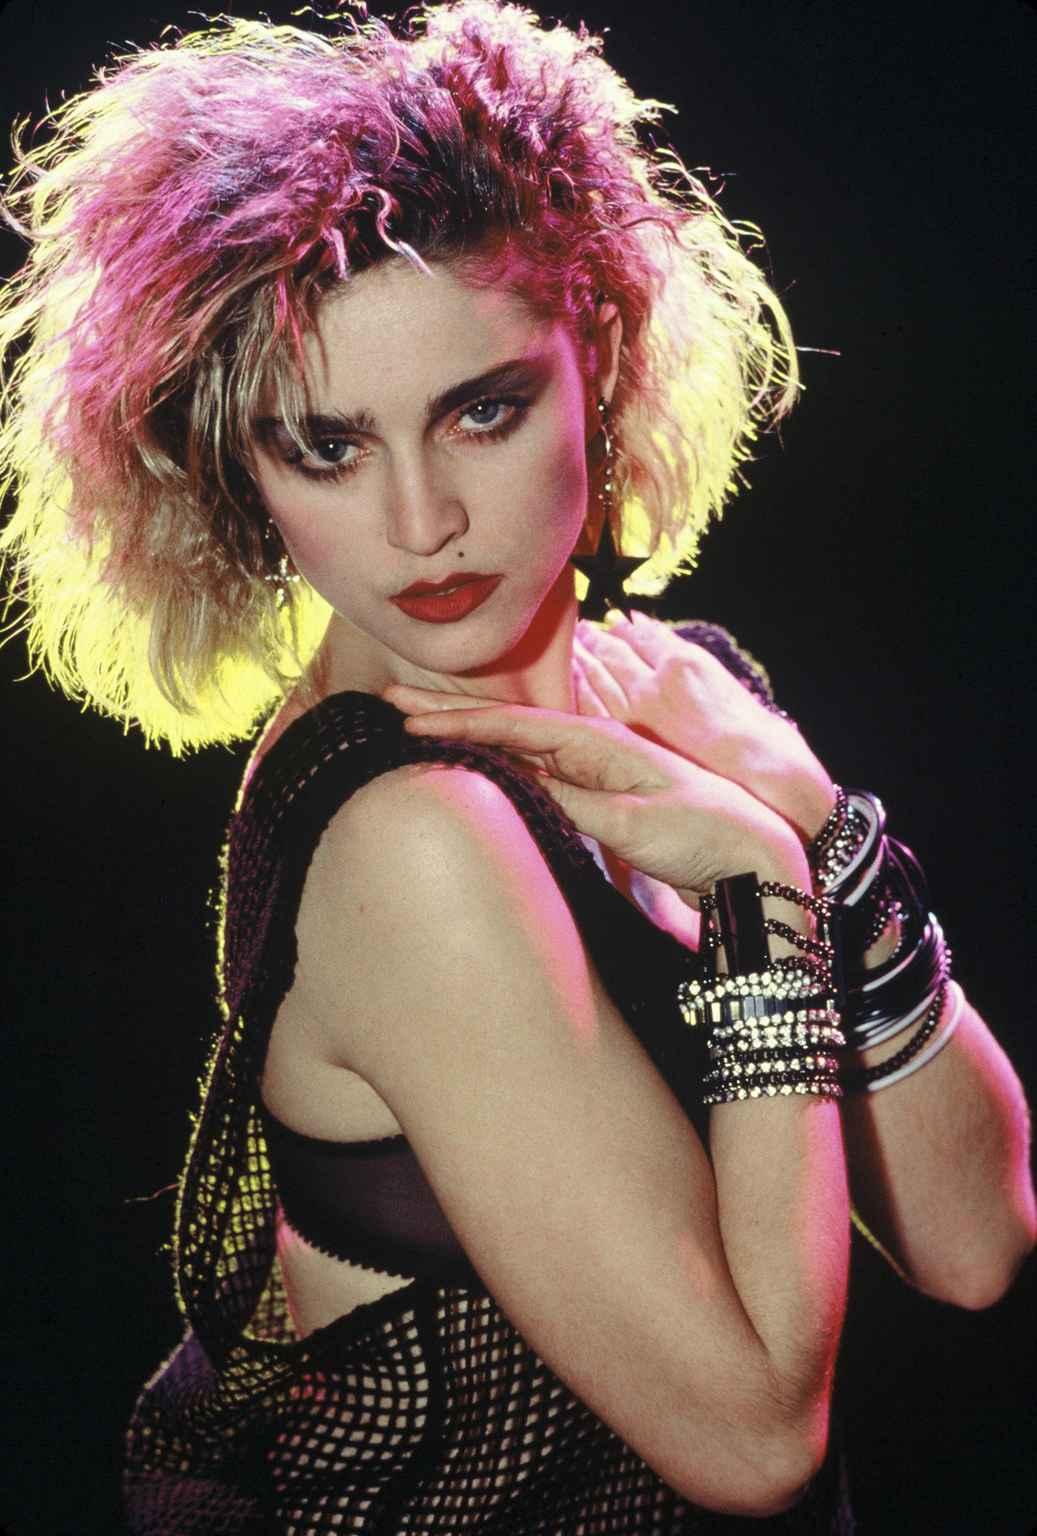 Madonna - Seance de pose. ETATS UNIS - 1986.